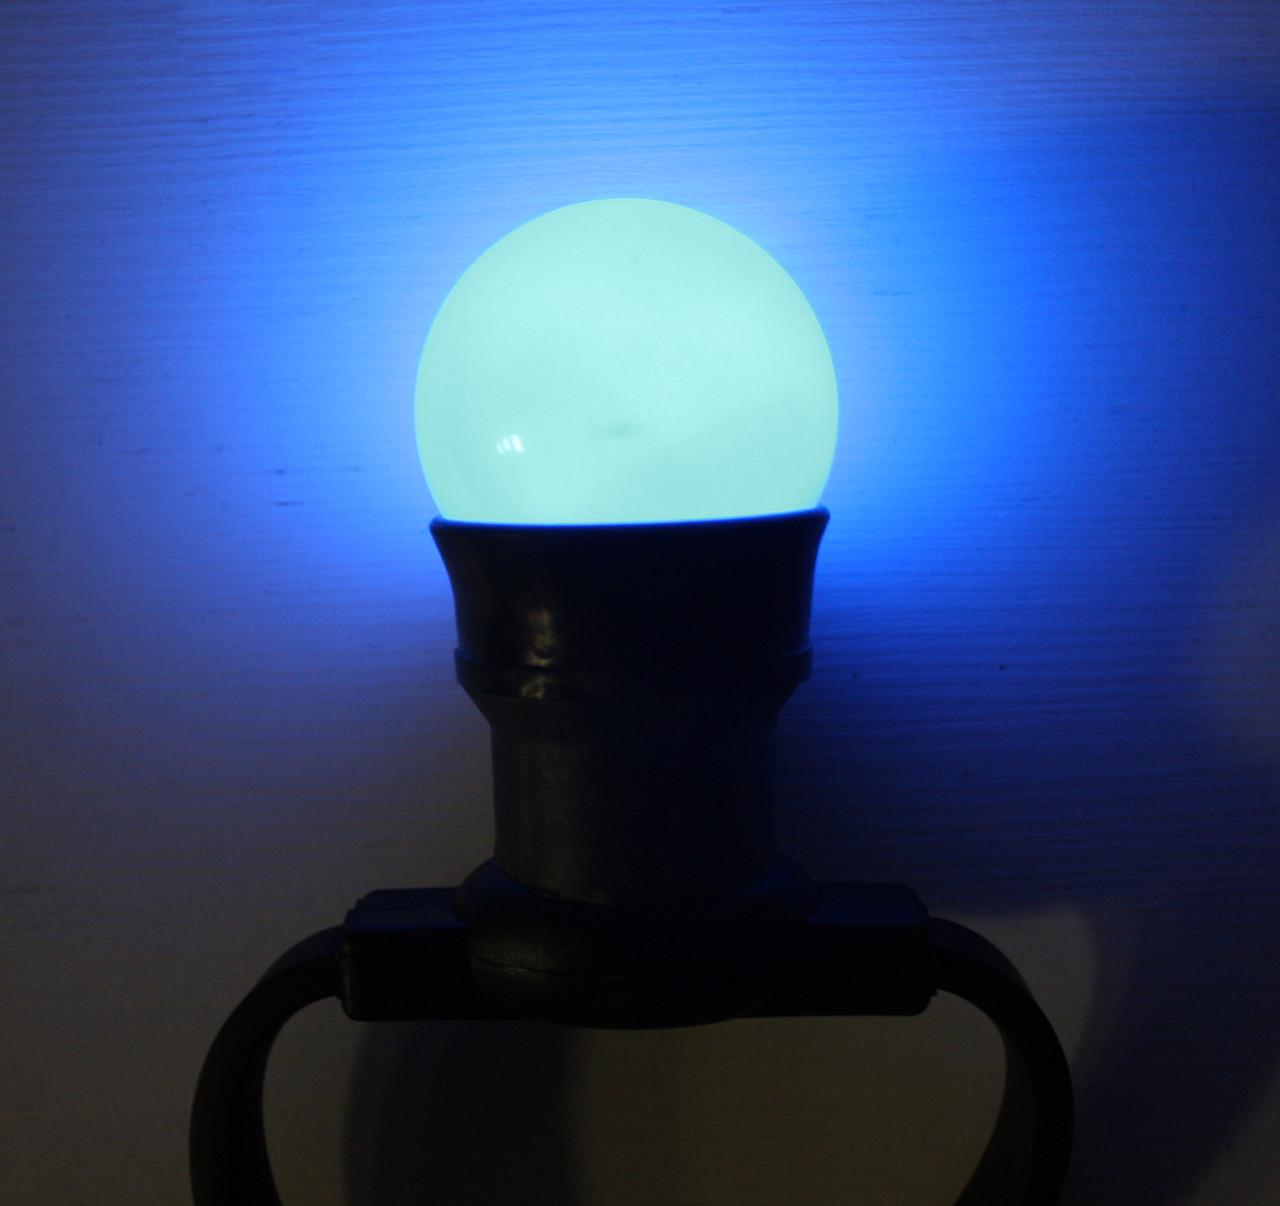 Уличная лампа для гирлянды Lumion Belt Light String (Белт лайт стринг) наружная цвет синий